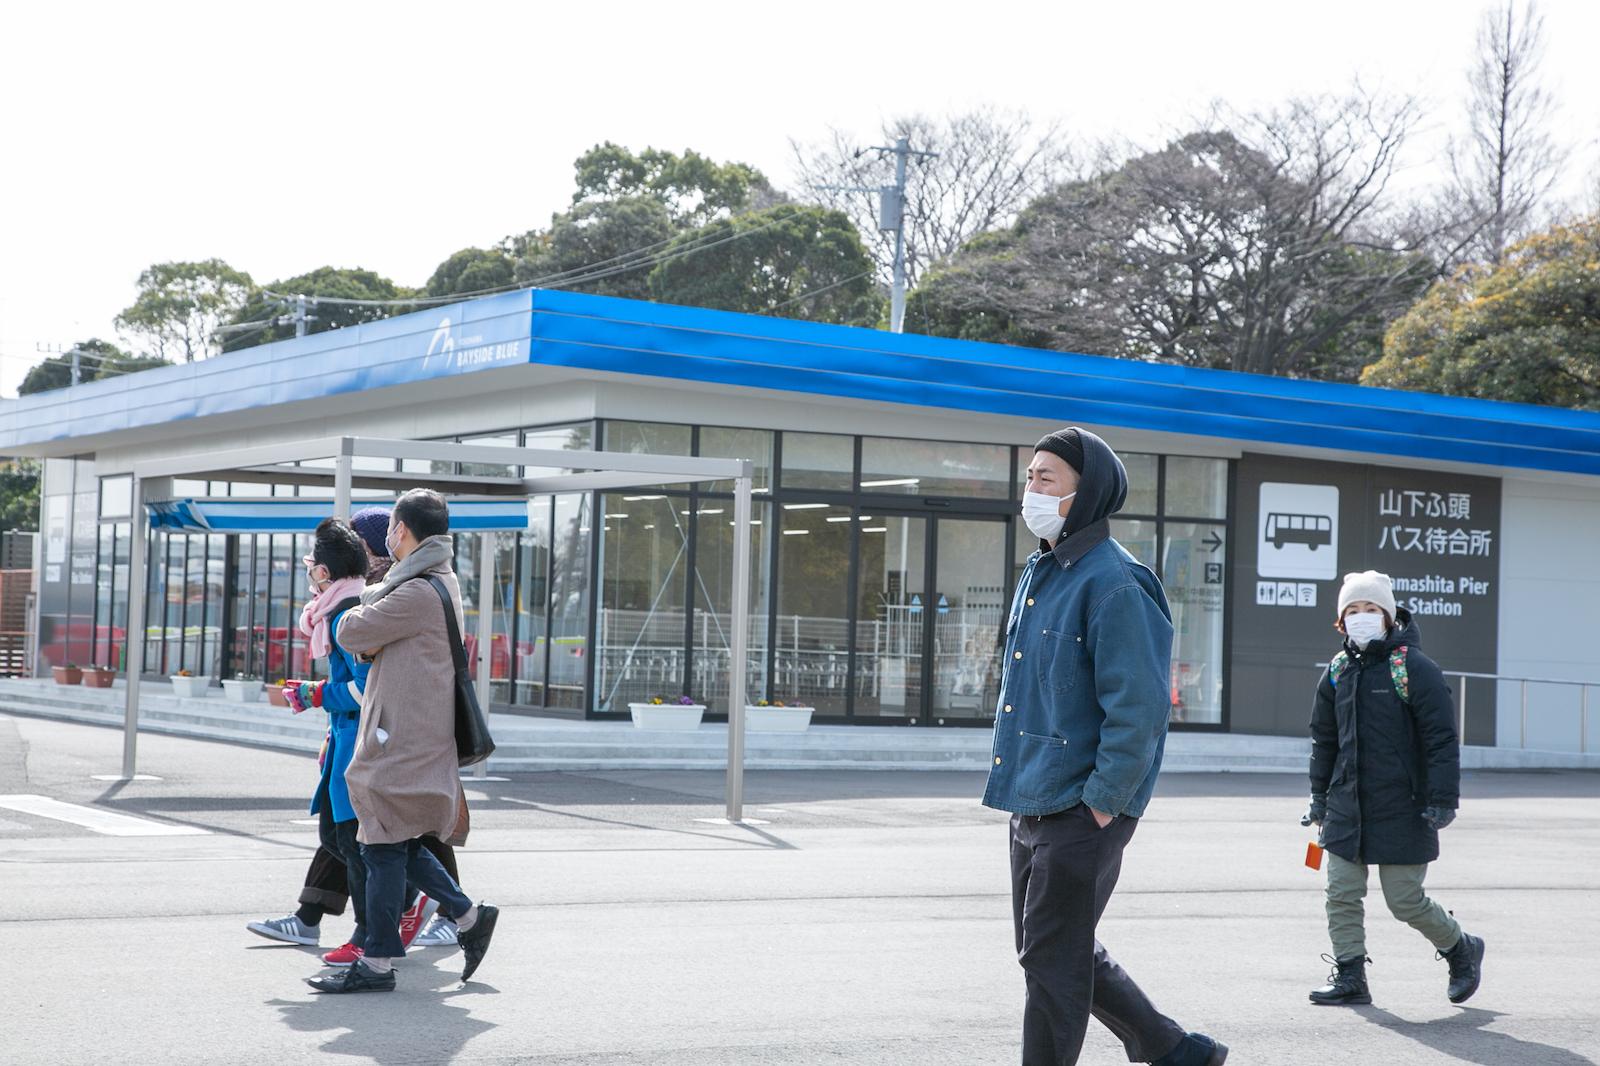 「RAUフェス 2020-2021」ワークショップでは、横浜の町を歩き参加者が映像素材の撮影を行った。